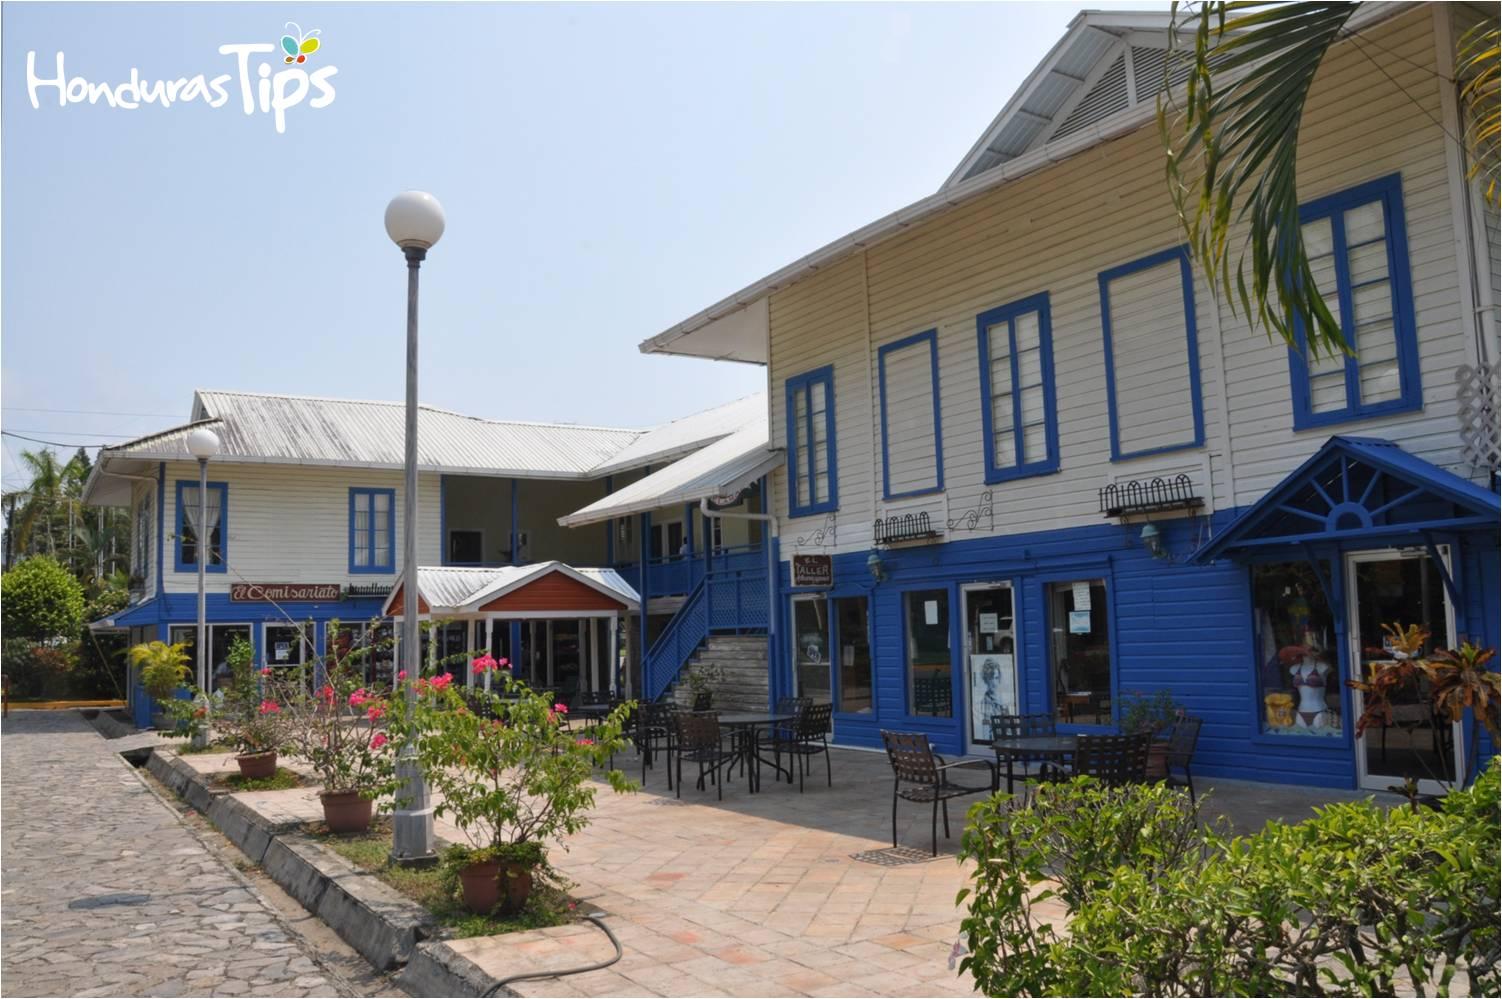 Telamar resort honduras tips for Villas telamar